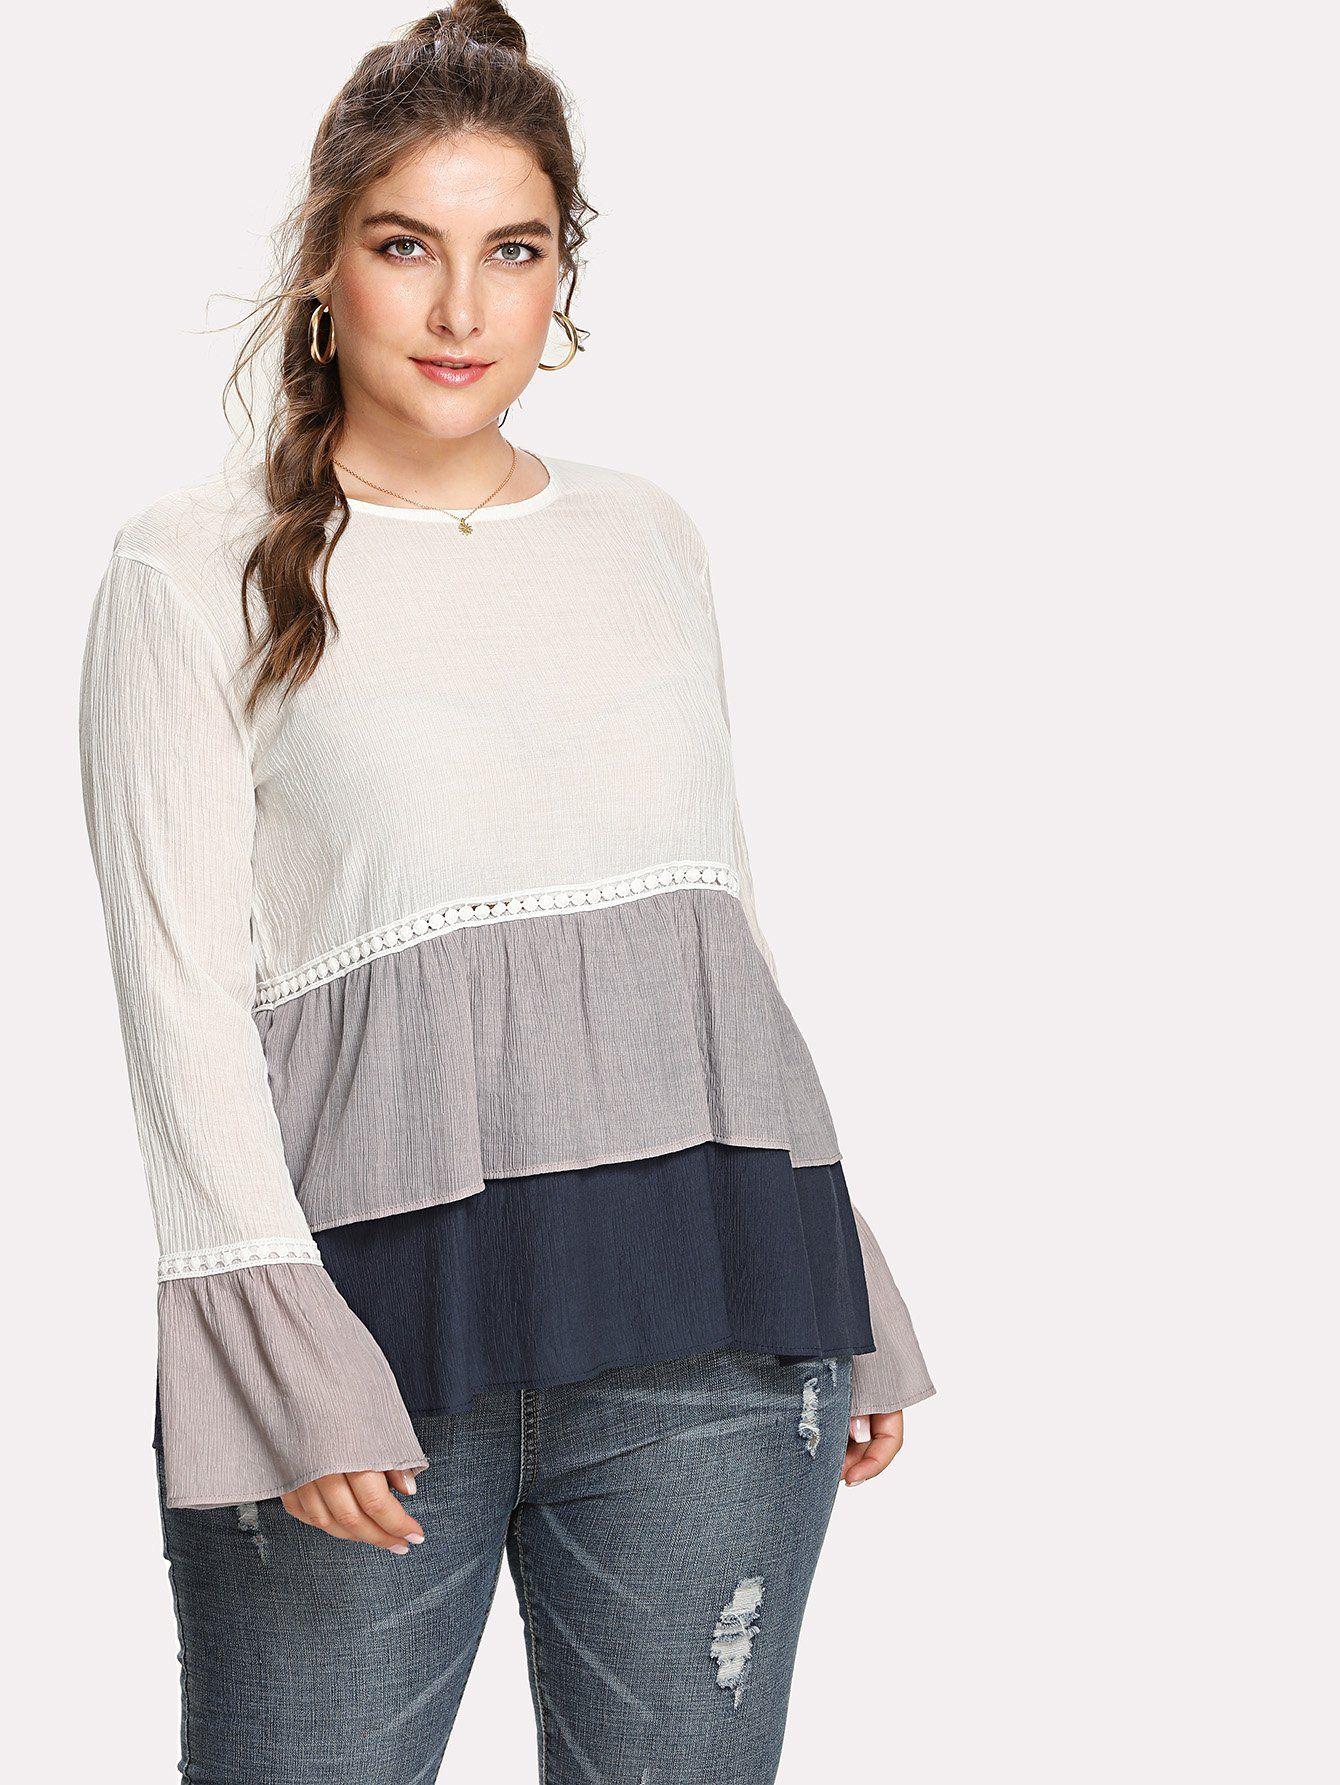 ca410d8d9ab Contrast Lace Layered Ruffle Hem Top